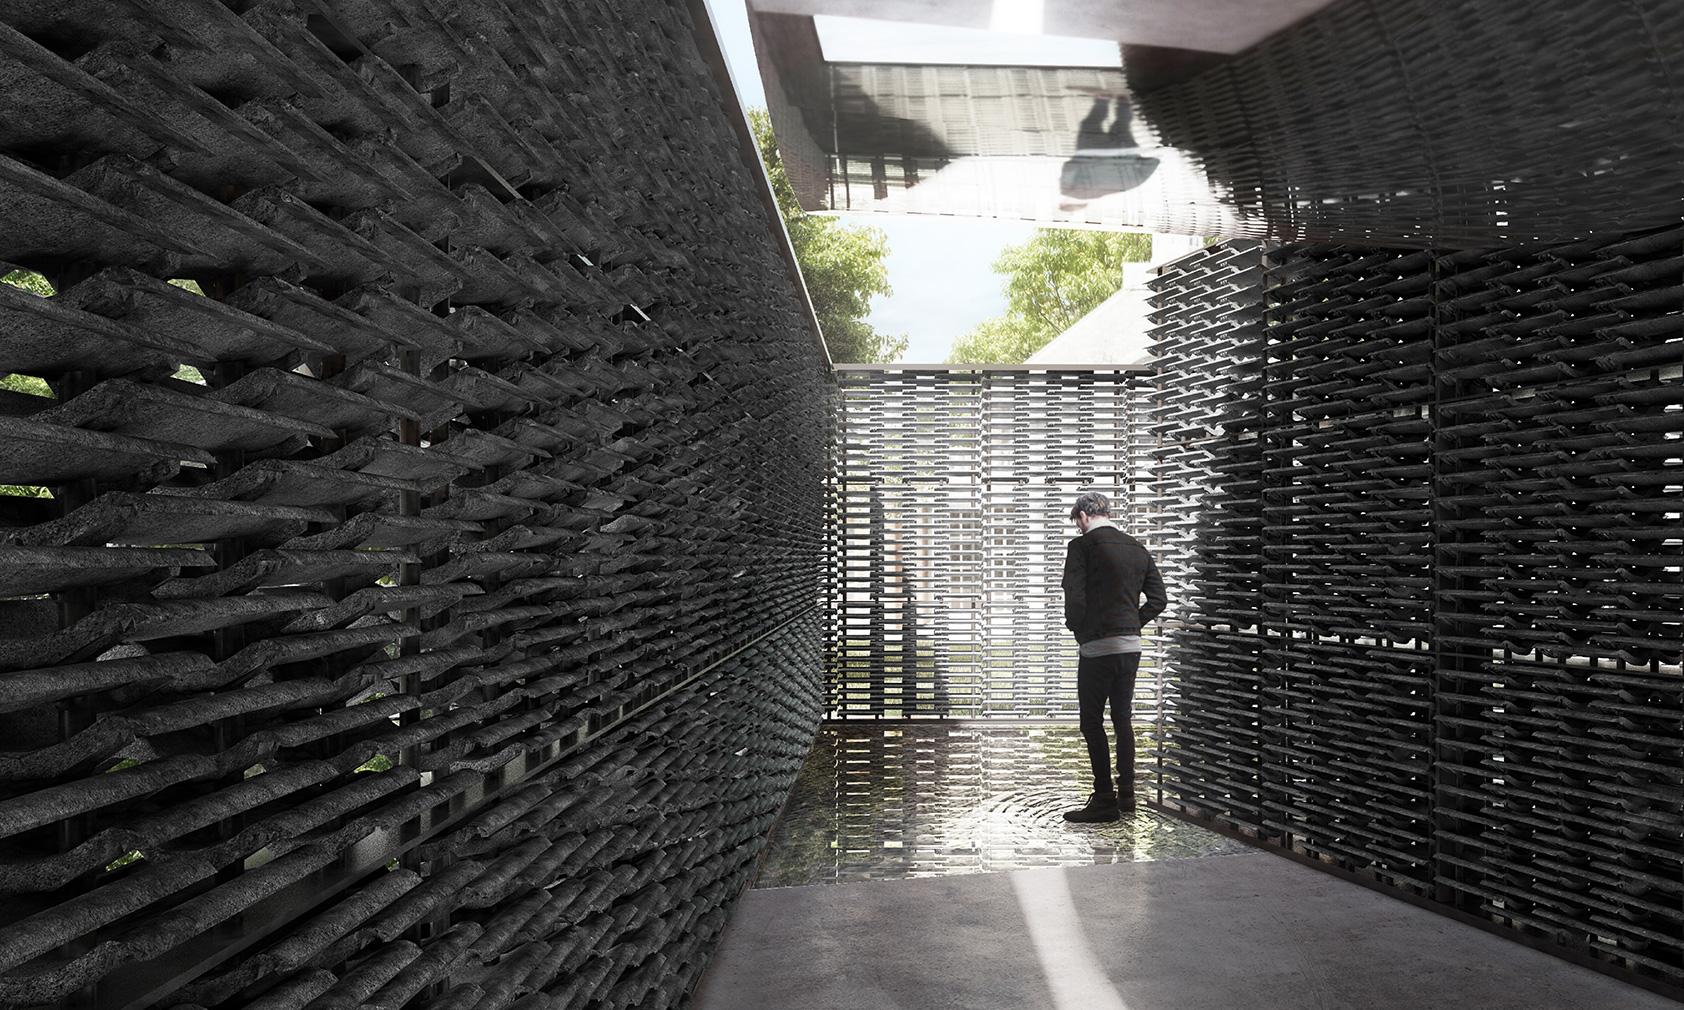 Serpentine Pavilion 2018 designed by Frida Escobedo, Taller de Arquitectura, © Frida Escobedo, Taller de Arquitectura. Renderings by Atmósfera